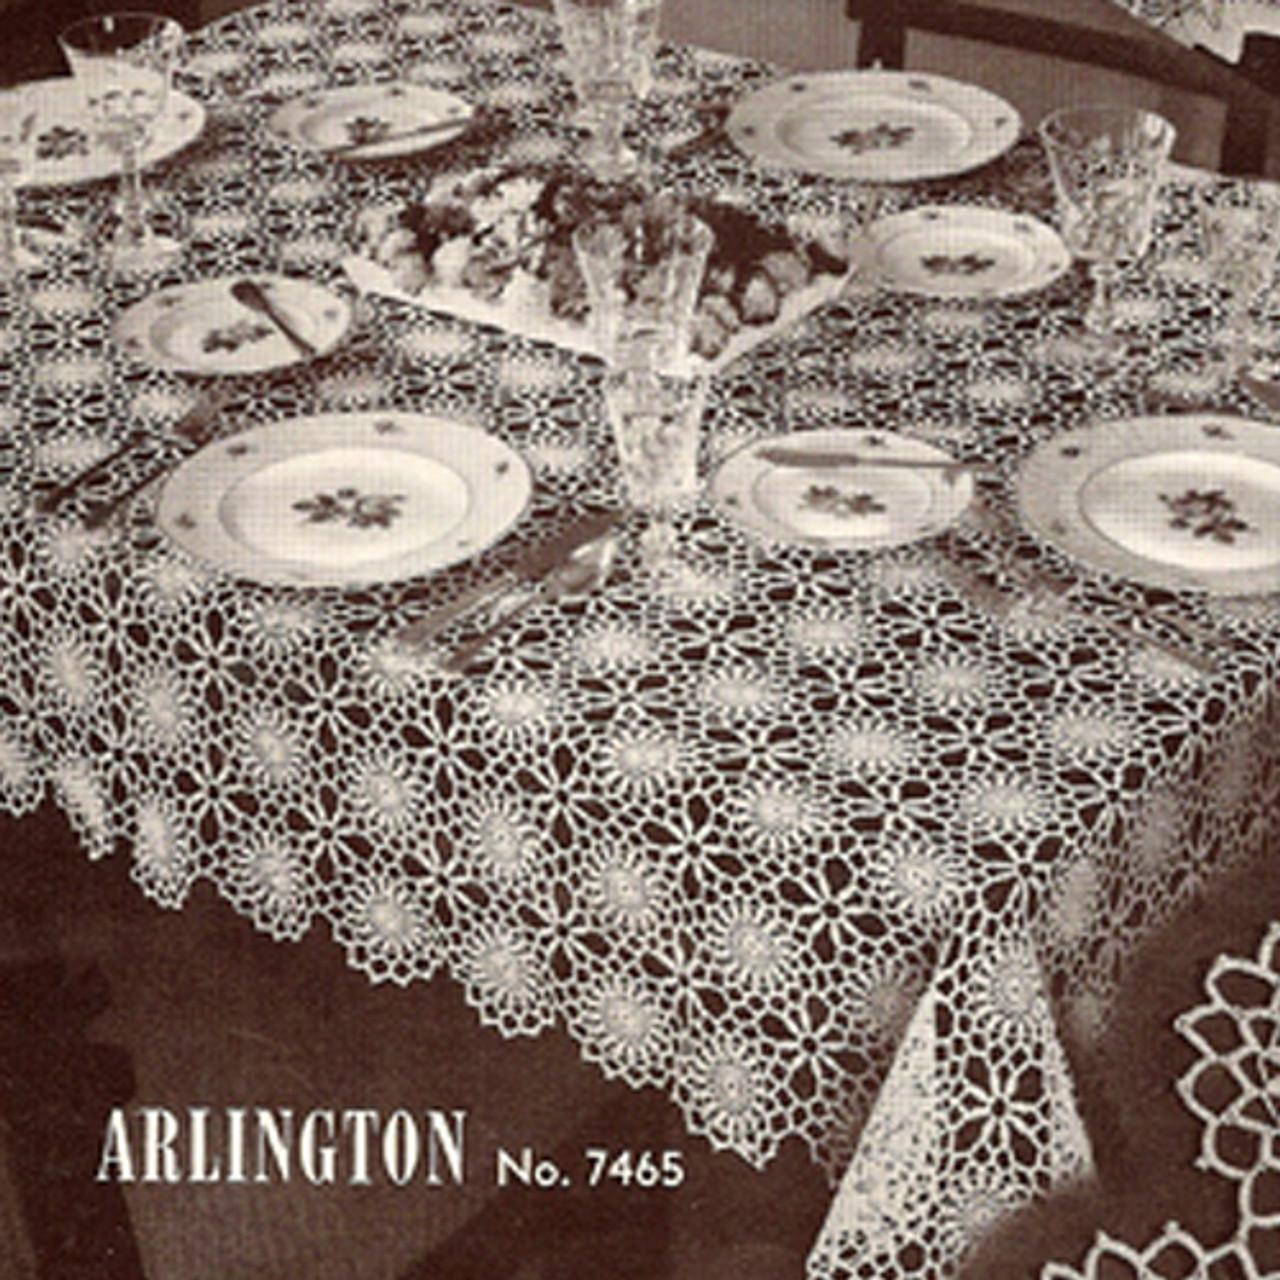 Crocheted Arlington Tablecloth pattern, Vintage 1950s